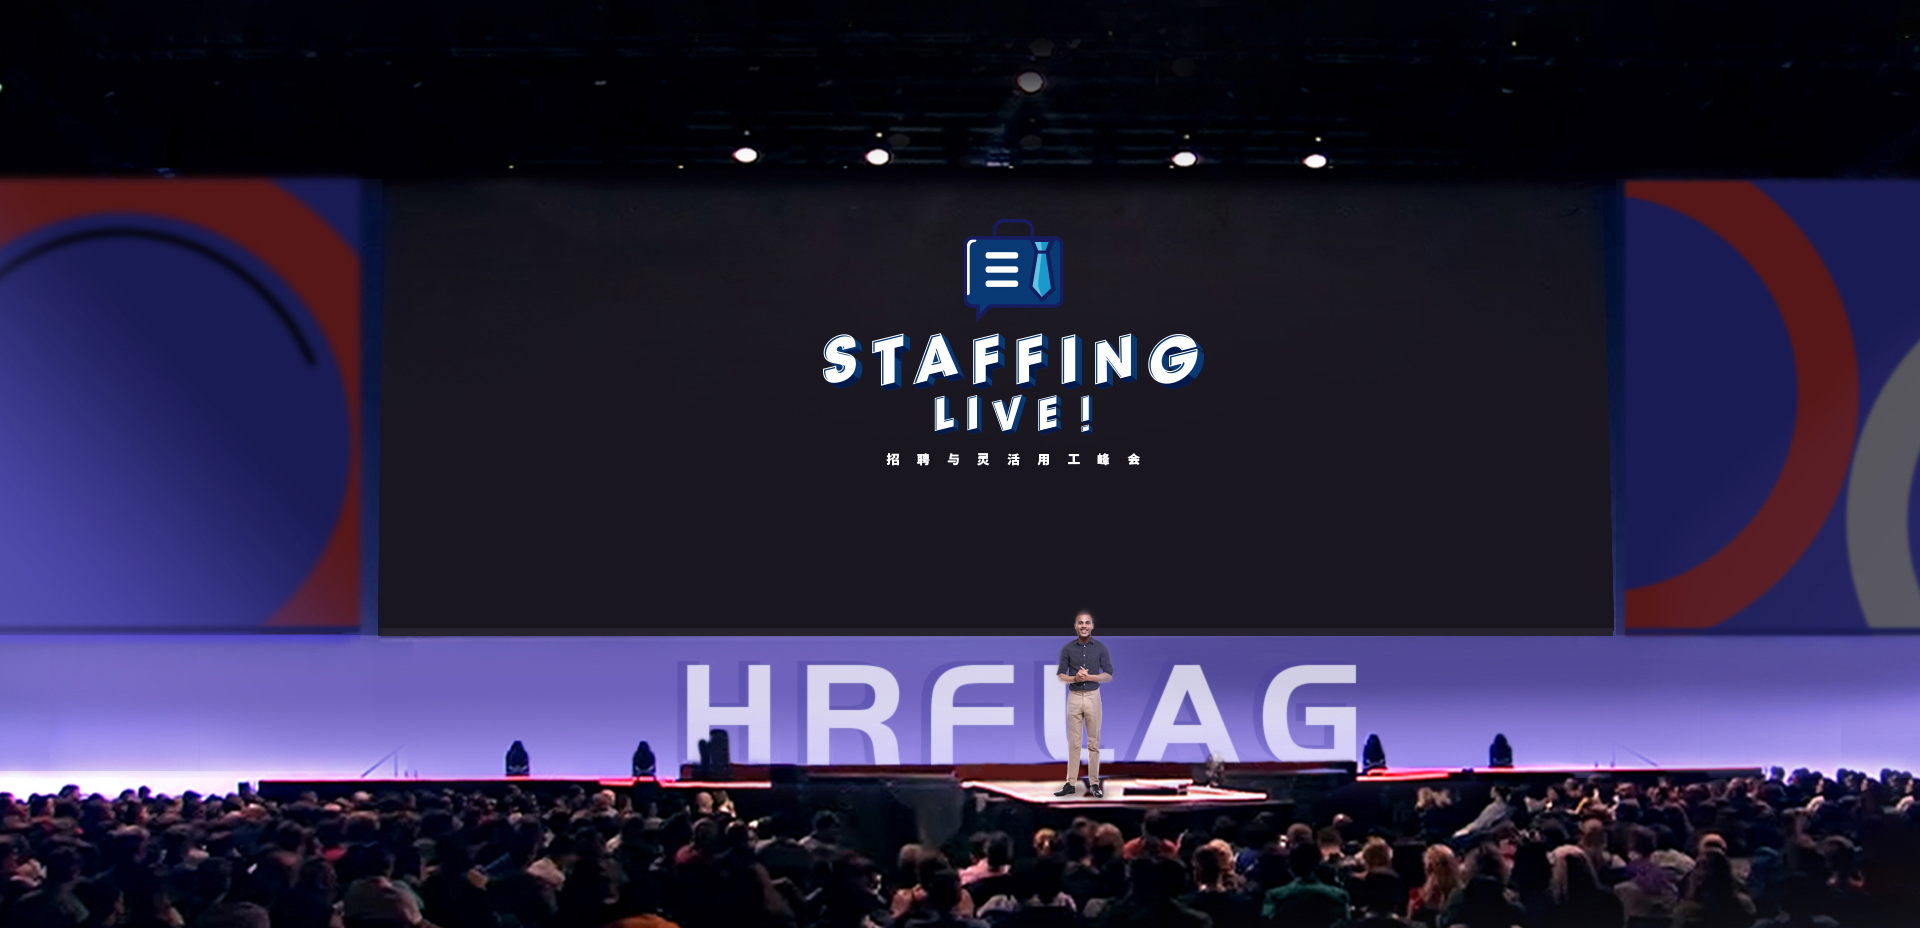 staffing live